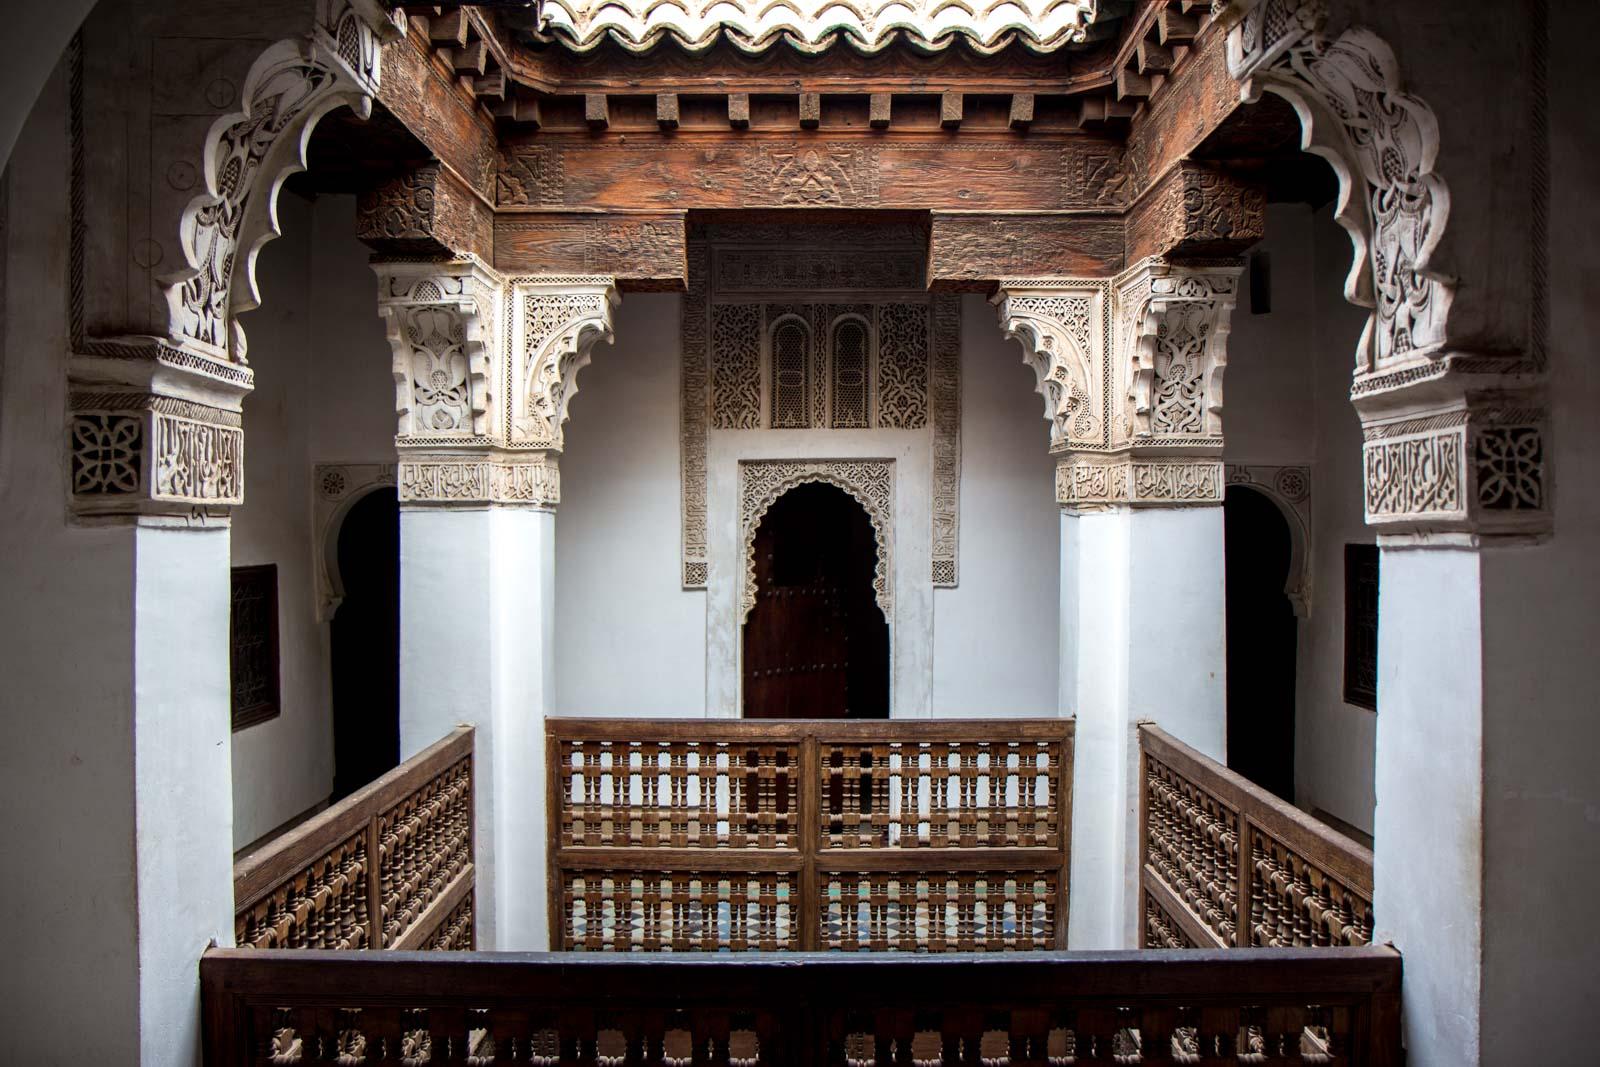 Ben Youssef Madrassa, Marrakech, Morocco